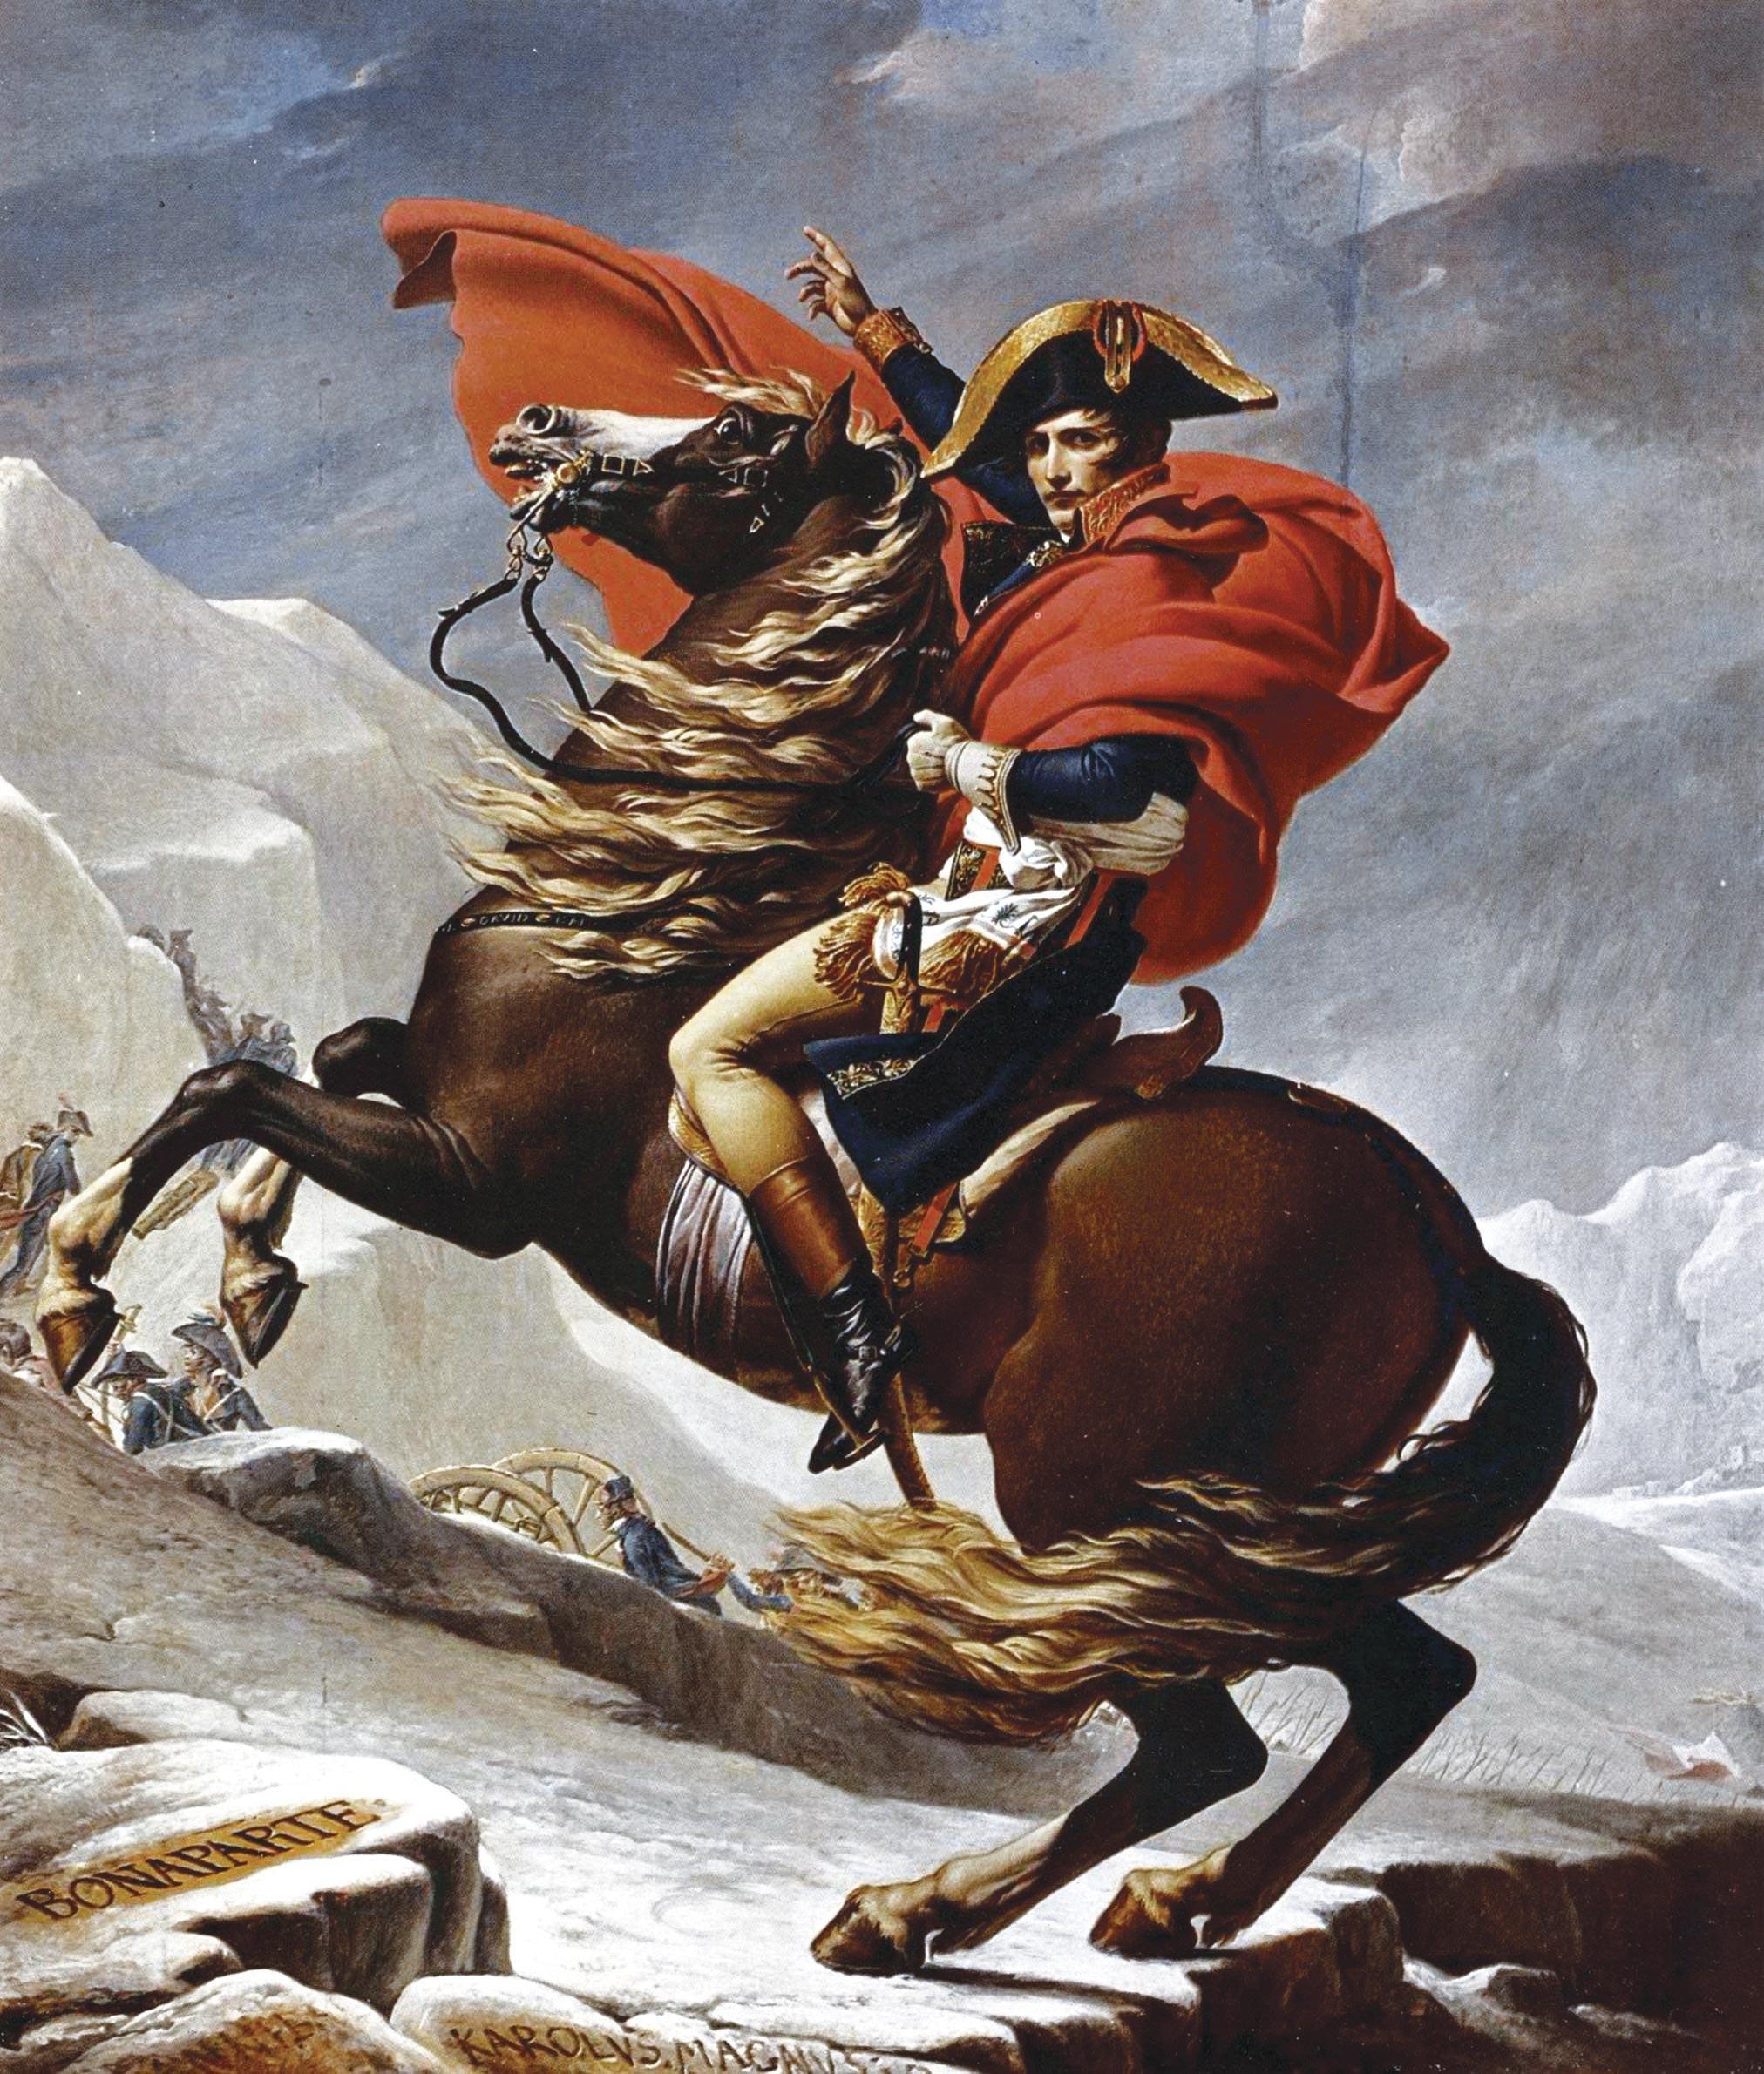 Bonaparte franchissant le Grand-Saint-Bernard